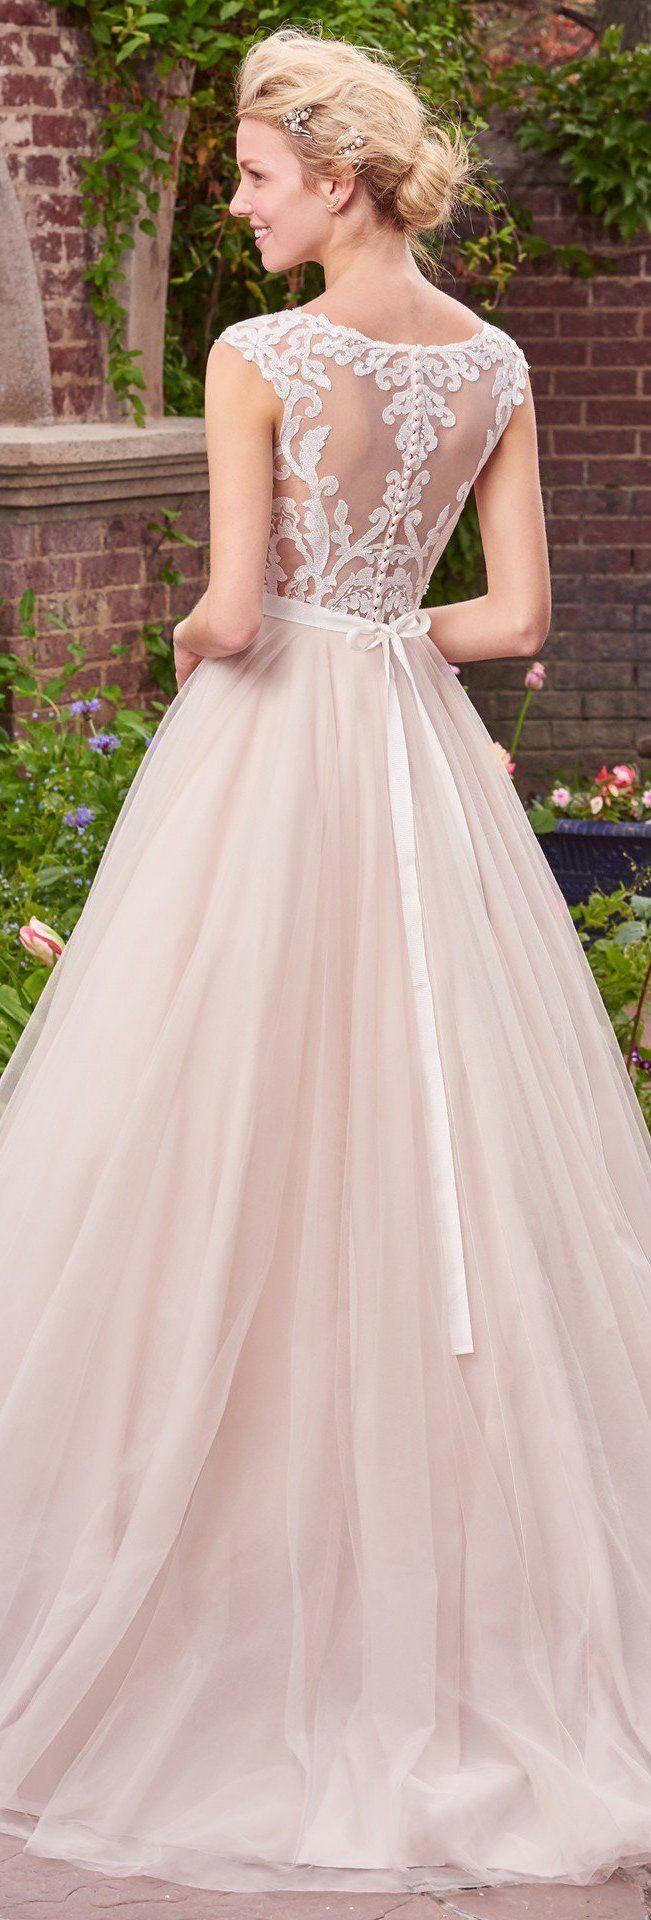 Maggie Sottero Wedding Dresses | Pinterest | Carrie, Wedding dress ...